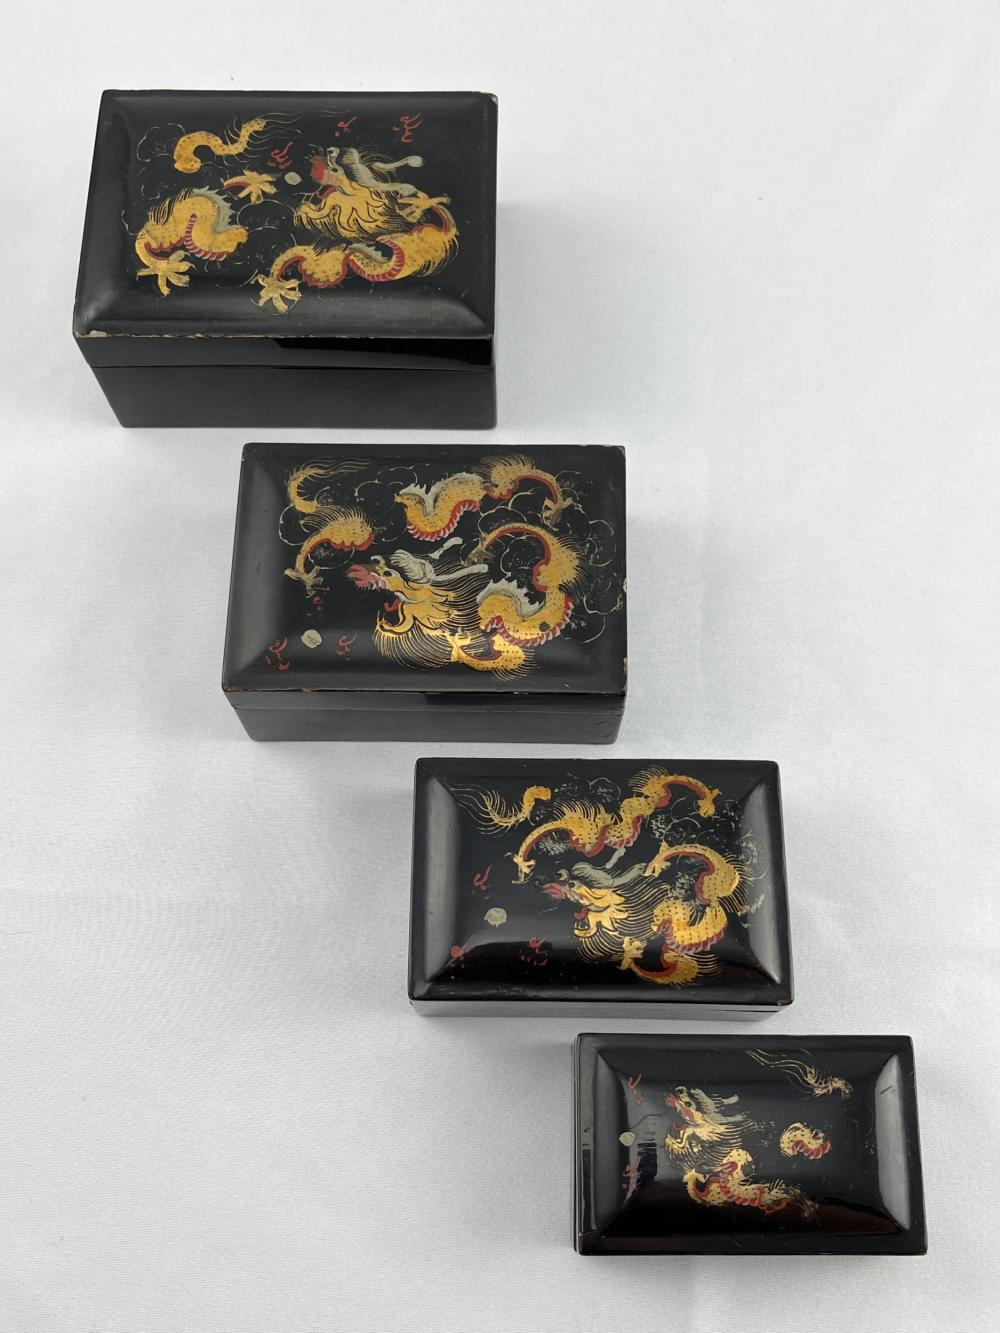 4 Japanese Black Lacquer Dragon Nesting Boxes